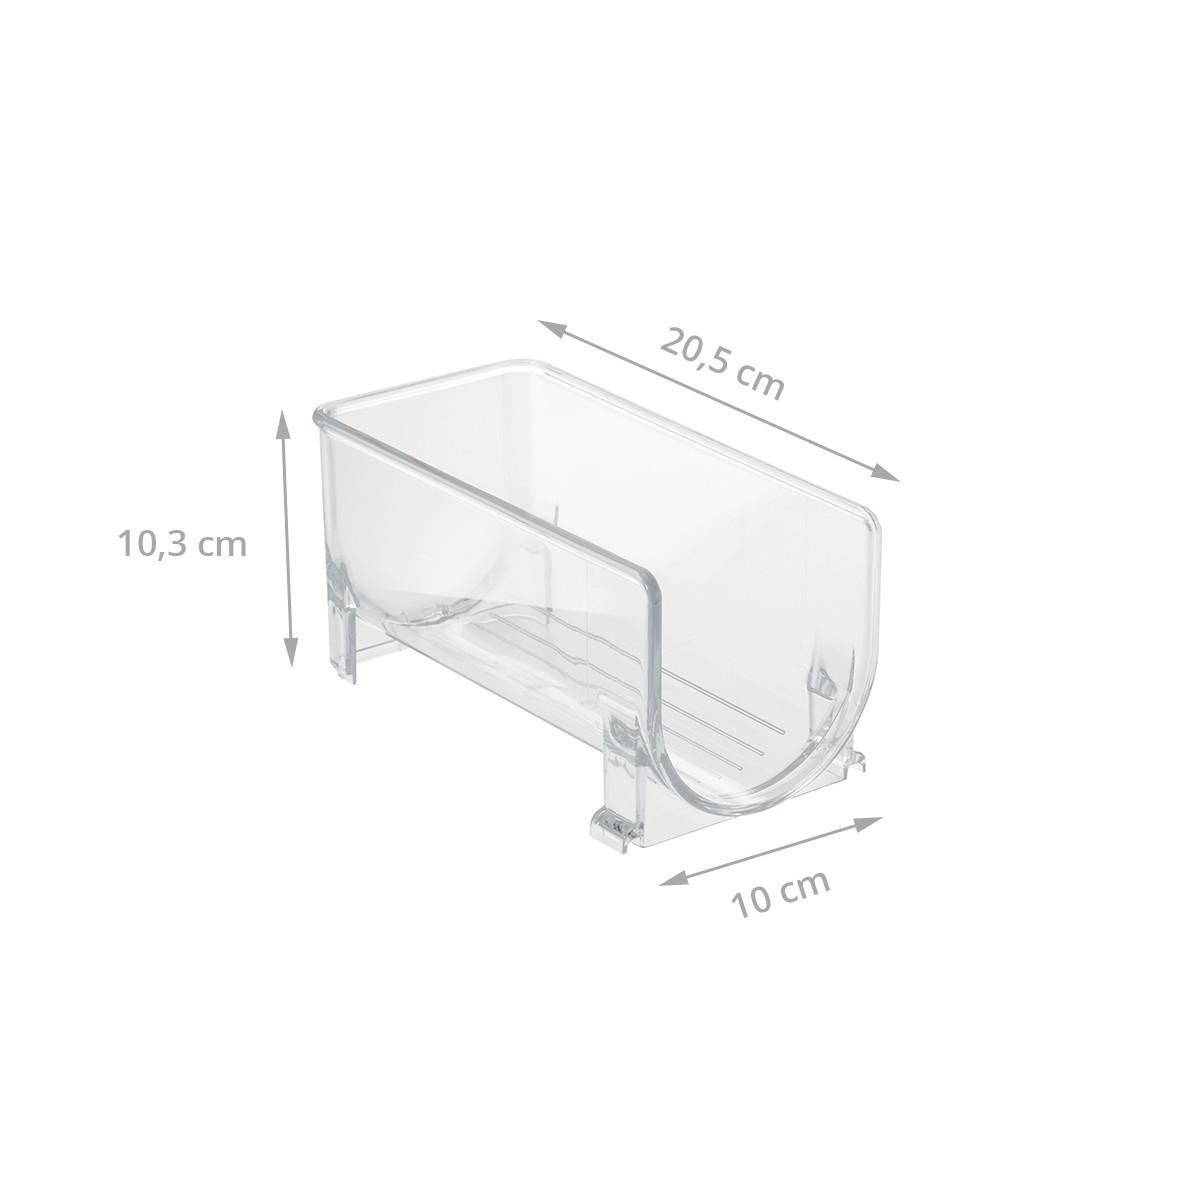 bac bouteille empilable en plastique transparent cave. Black Bedroom Furniture Sets. Home Design Ideas